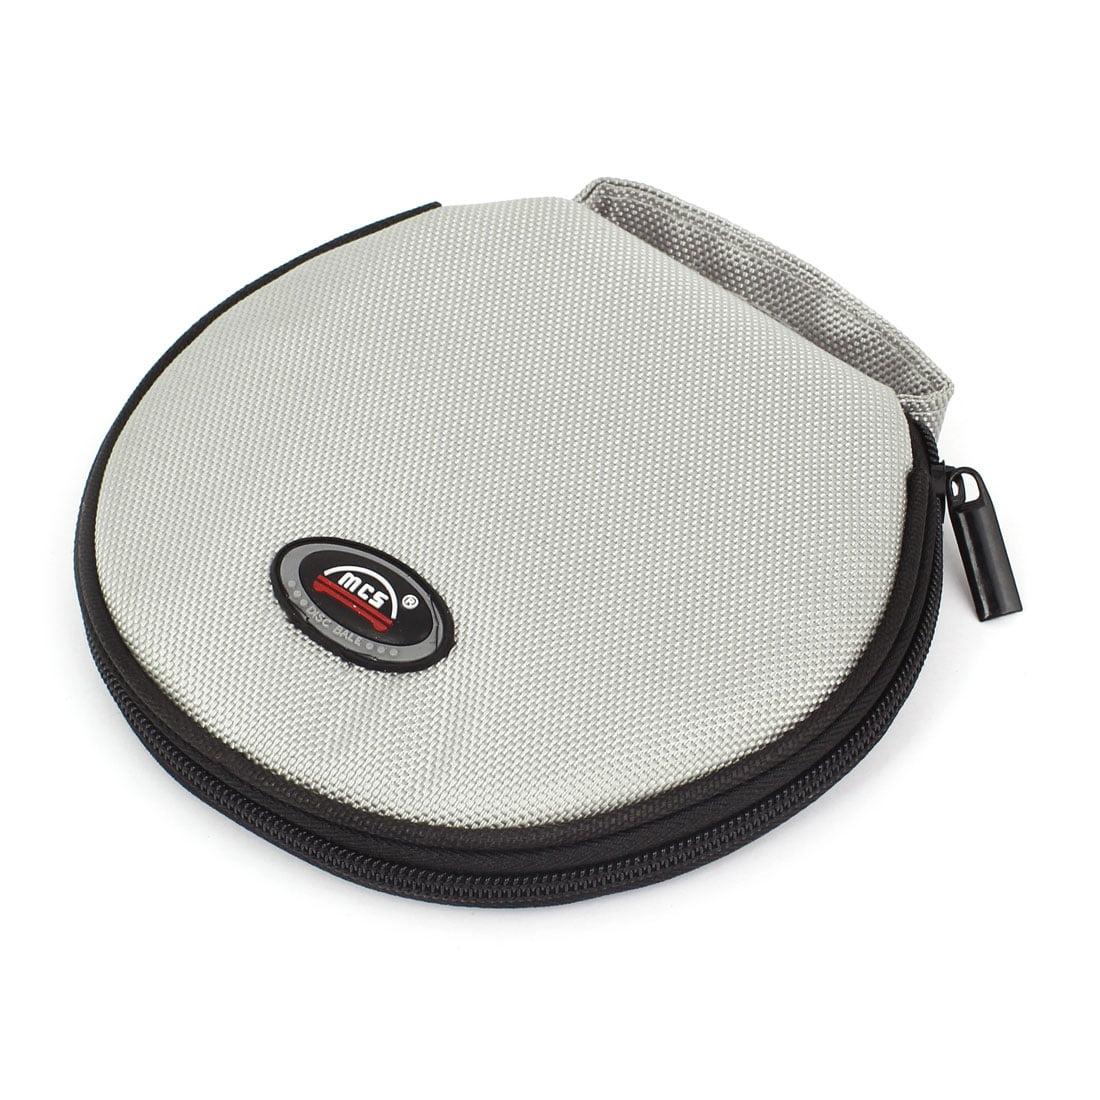 Round Shaped 20 Slots CD Discs Zipper Closure Holder Bag Wallet Gray